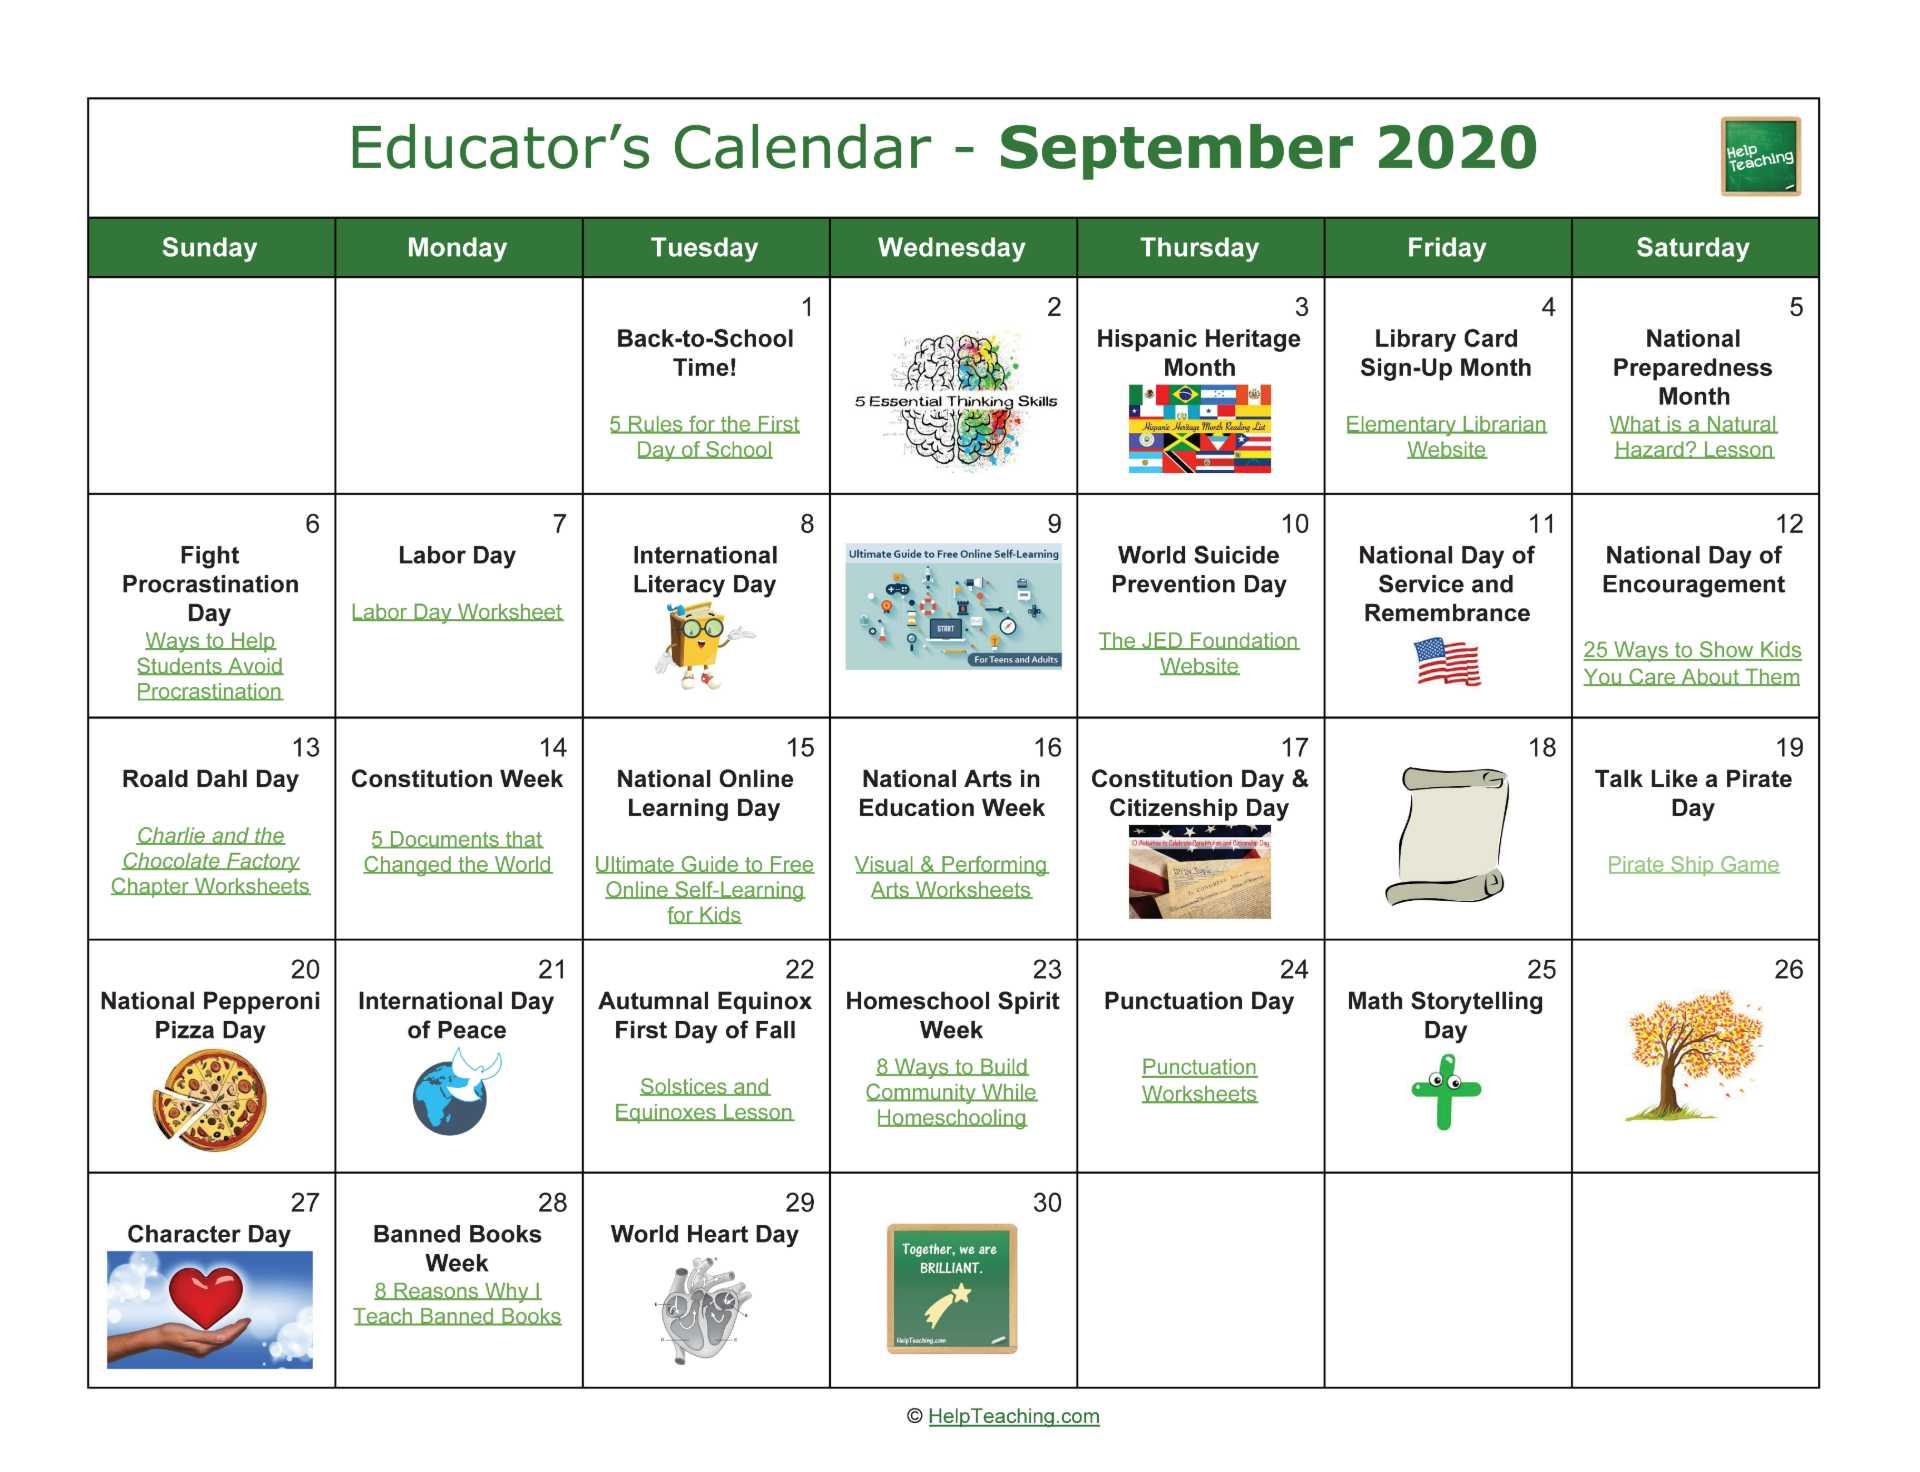 Us Educator'S Calendar 2020-2021 pertaining to Printable National Day Calendar 2021